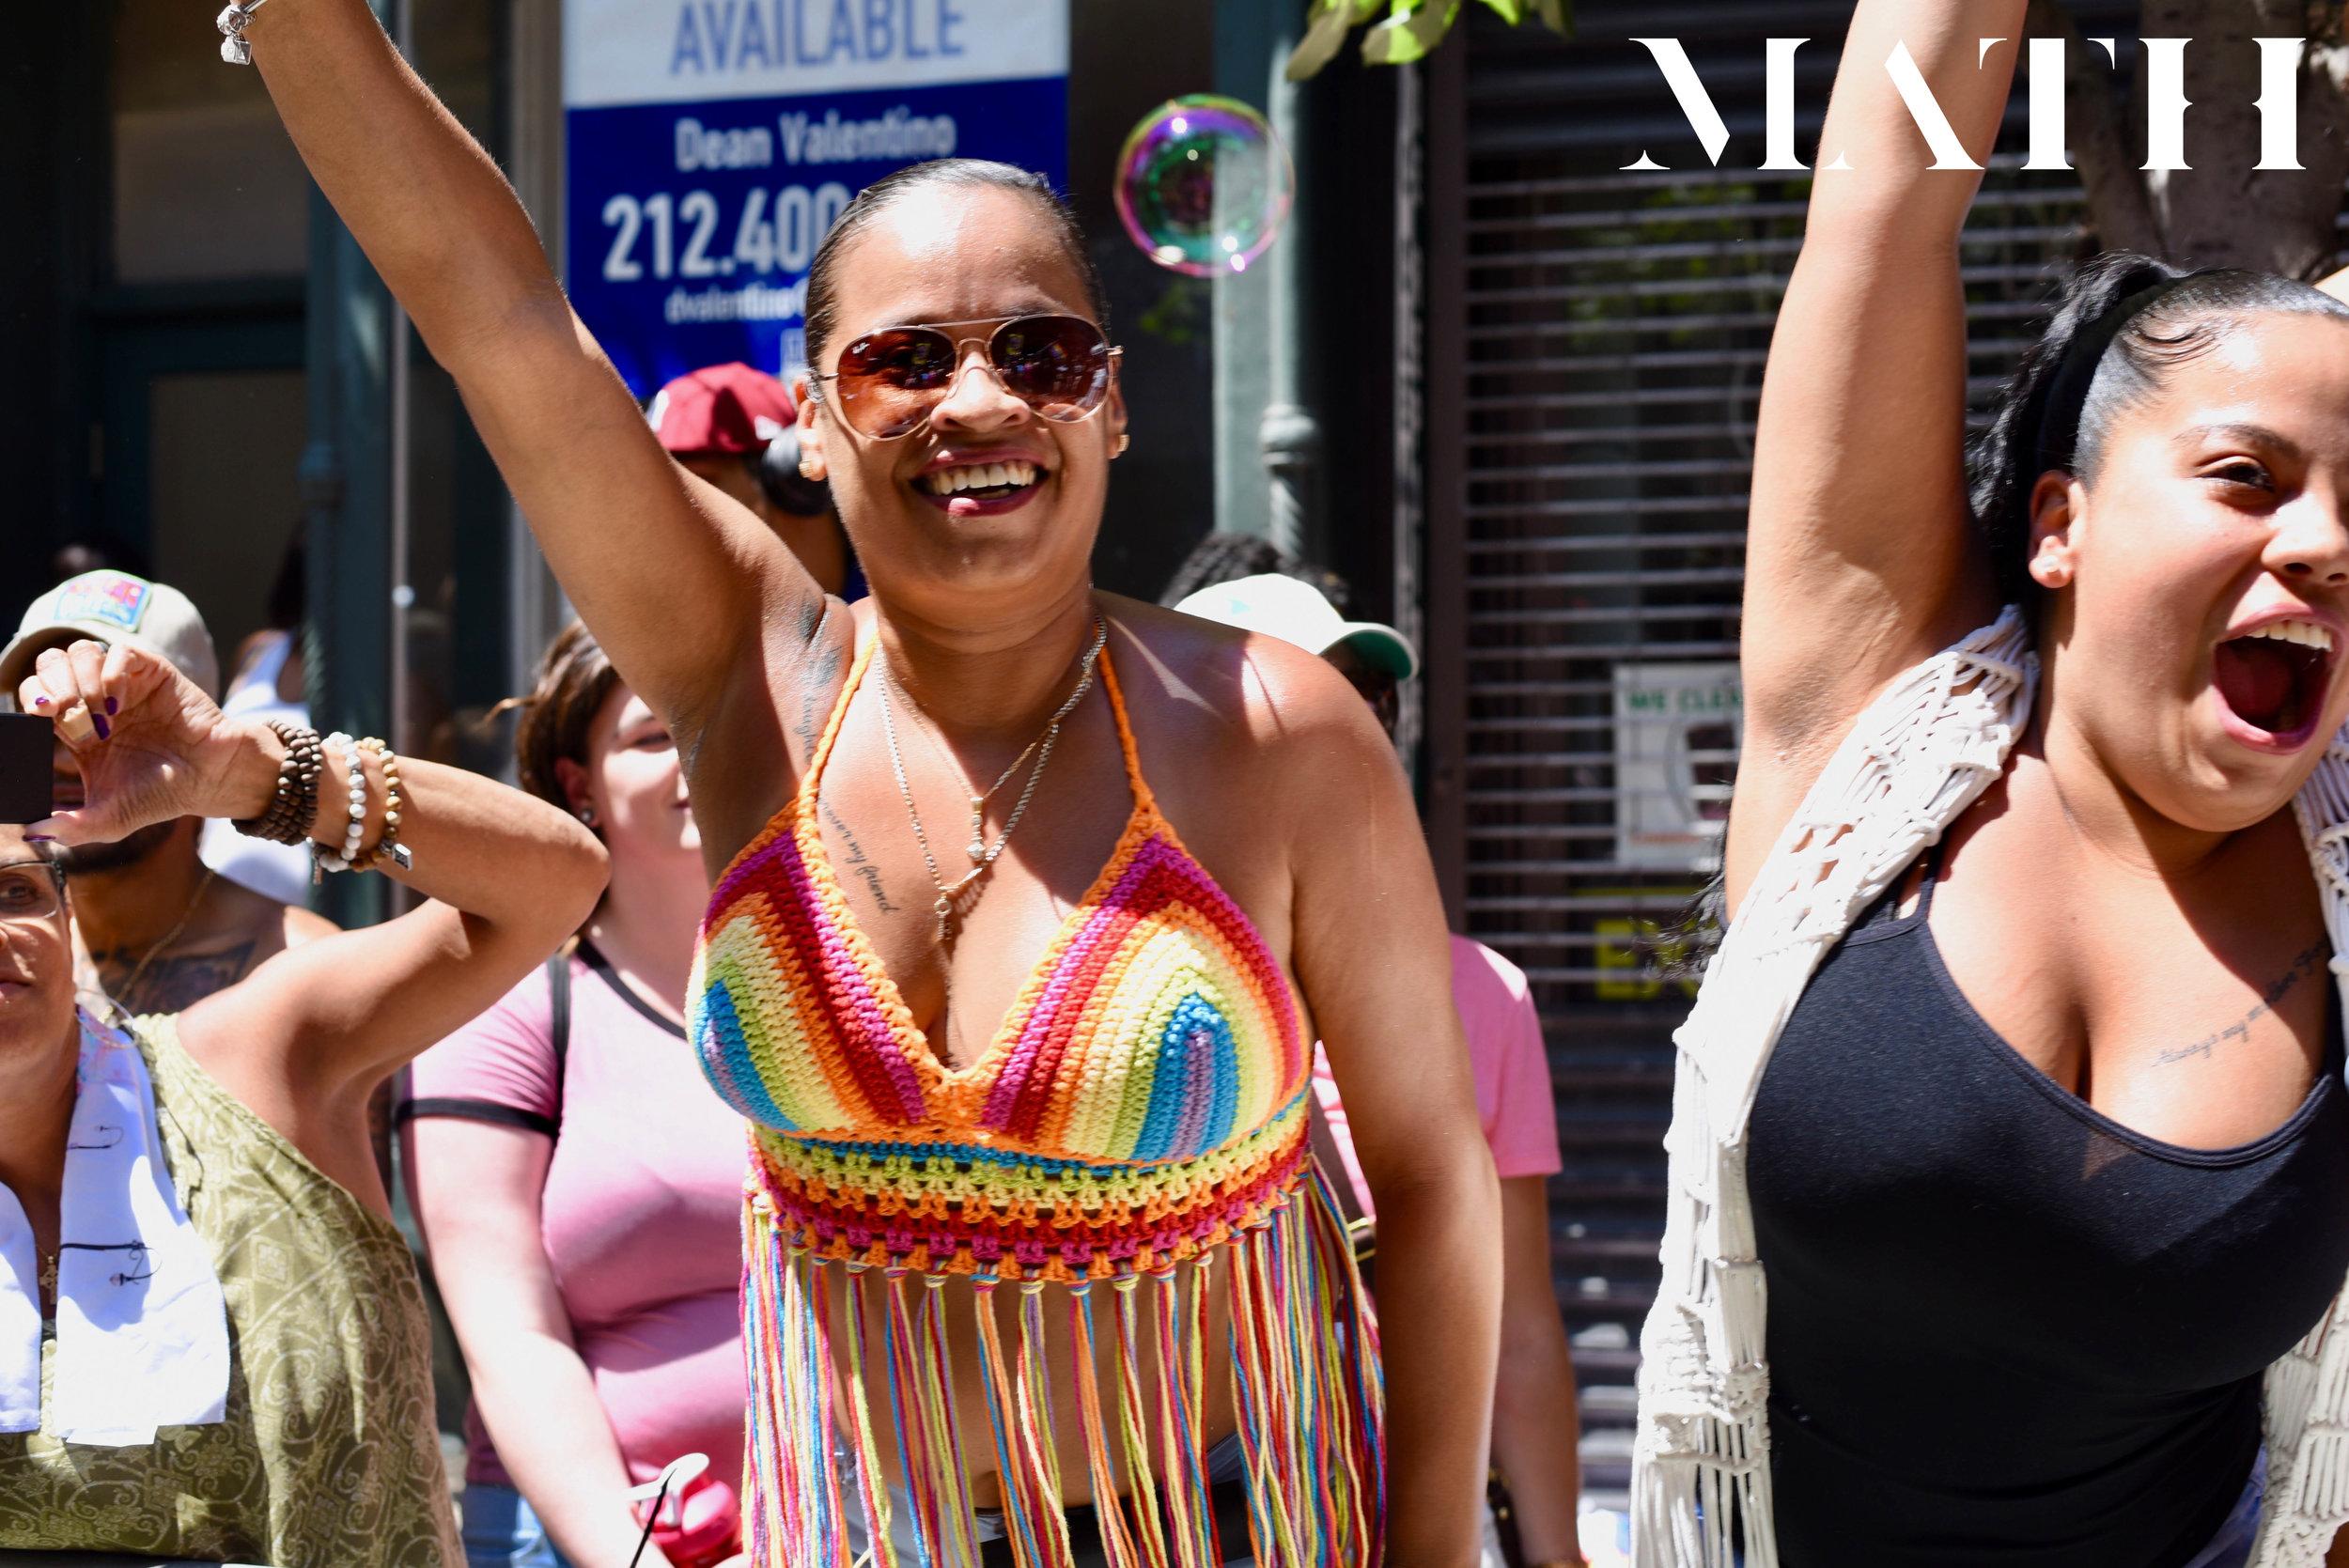 NYC Pride_Ginger Hollander 3.jpg